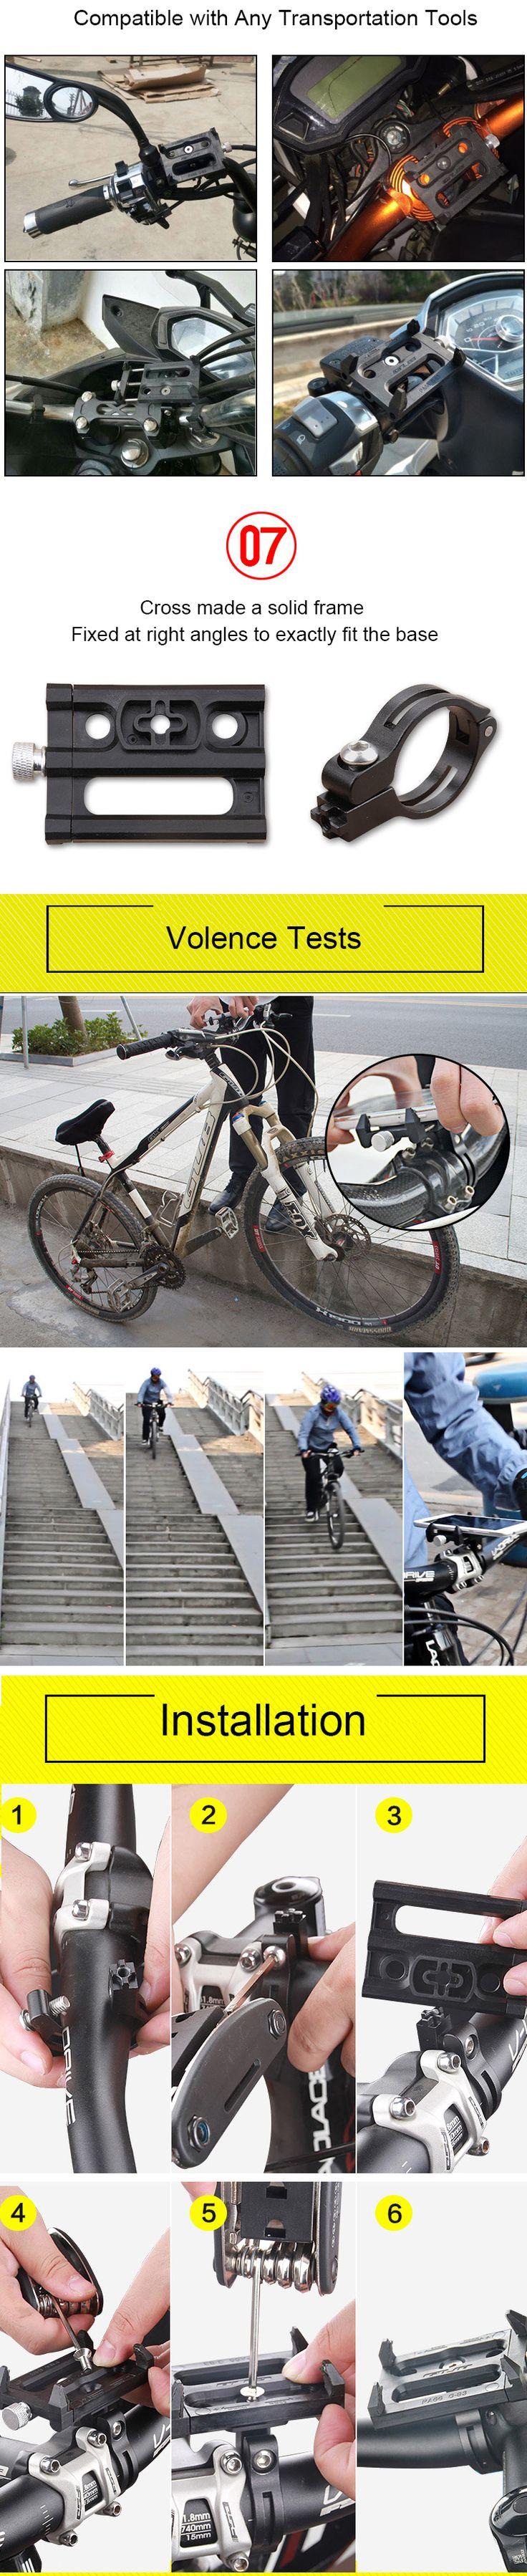 GUB G-83 Anti-Slip Universal Bicycle 3.5-6.2inch Phone Holder Mount Bracket for Smart Mobile Phone Handlebar Clip Stand